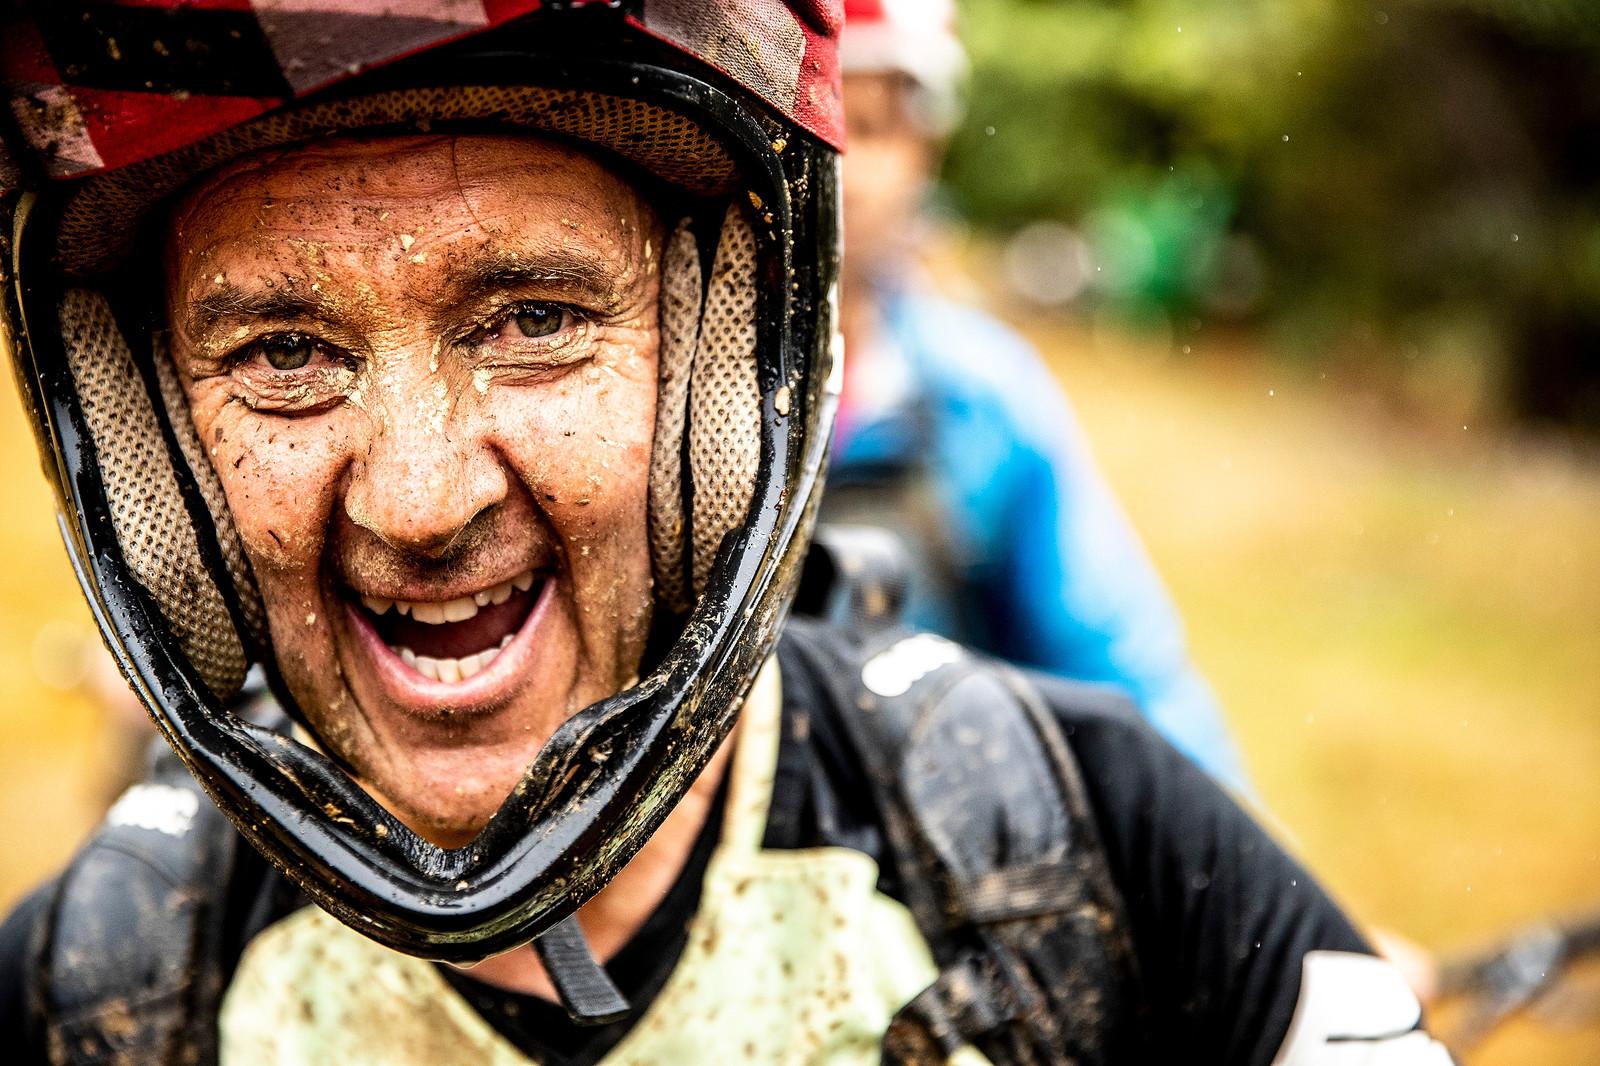 NZEnduro19  m1 8535 - 2019 NZ Enduro Day 2 Photo Gallery - Mountain Biking Pictures - Vital MTB